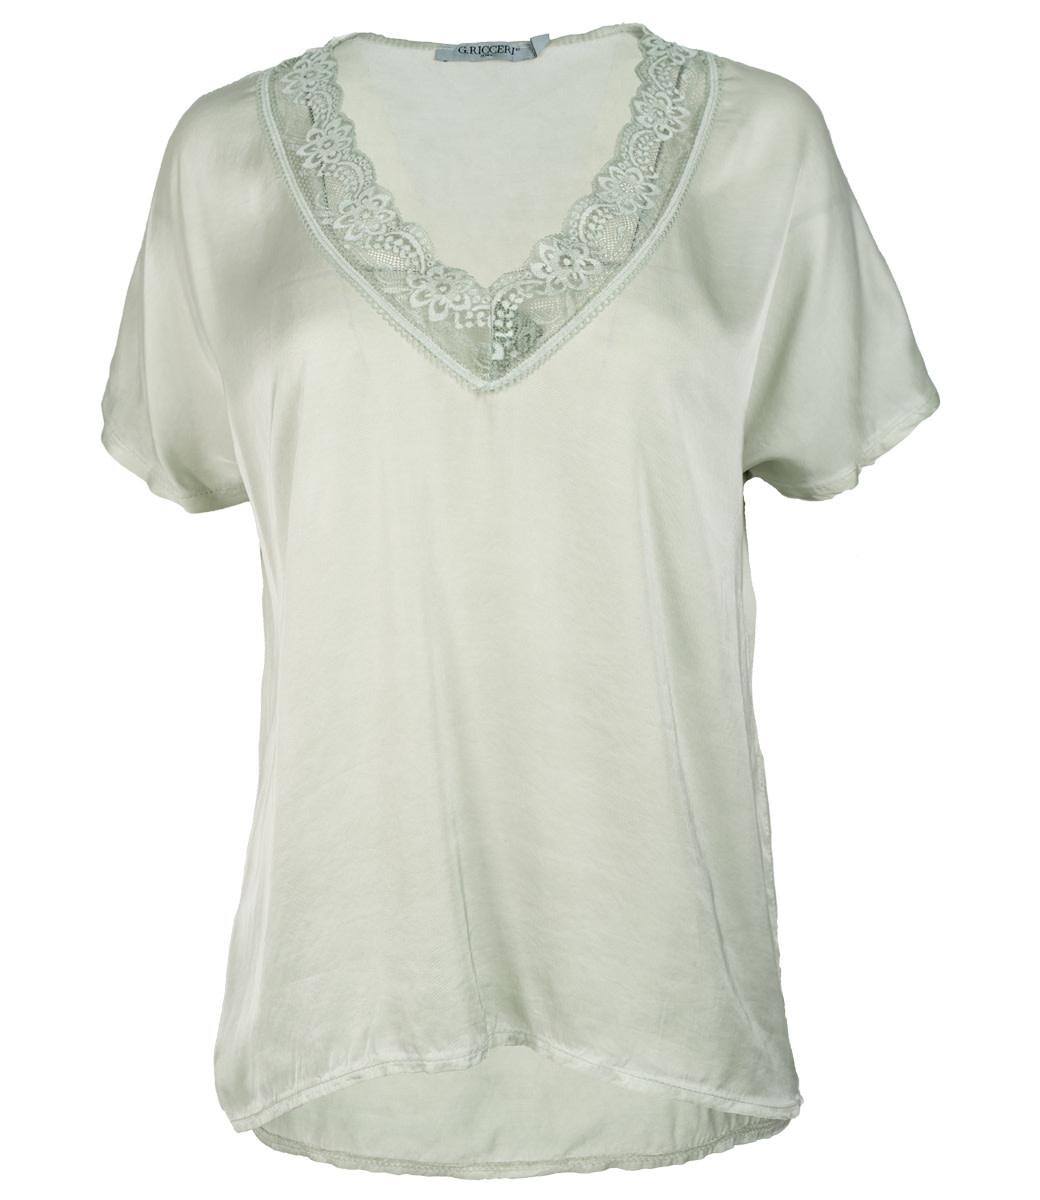 Gemma Ricceri Shirt satijn groen Anja